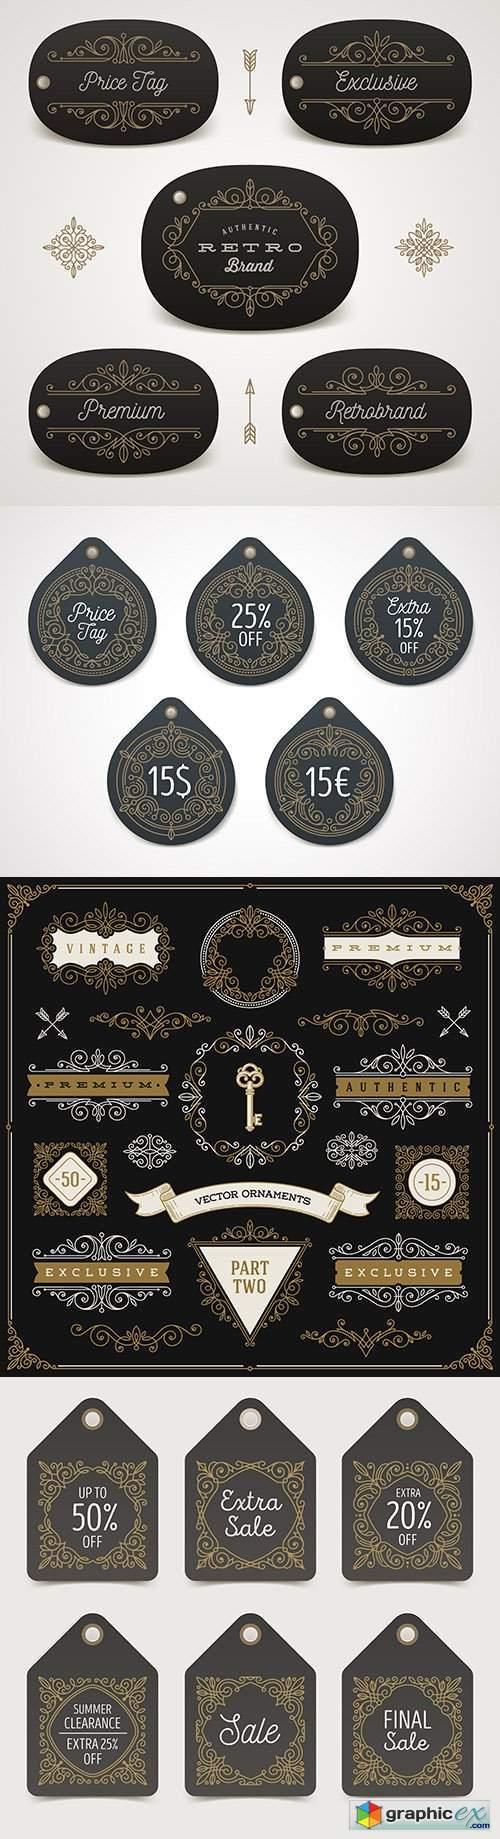 Vintage monogram brand name ornament design illustration 3